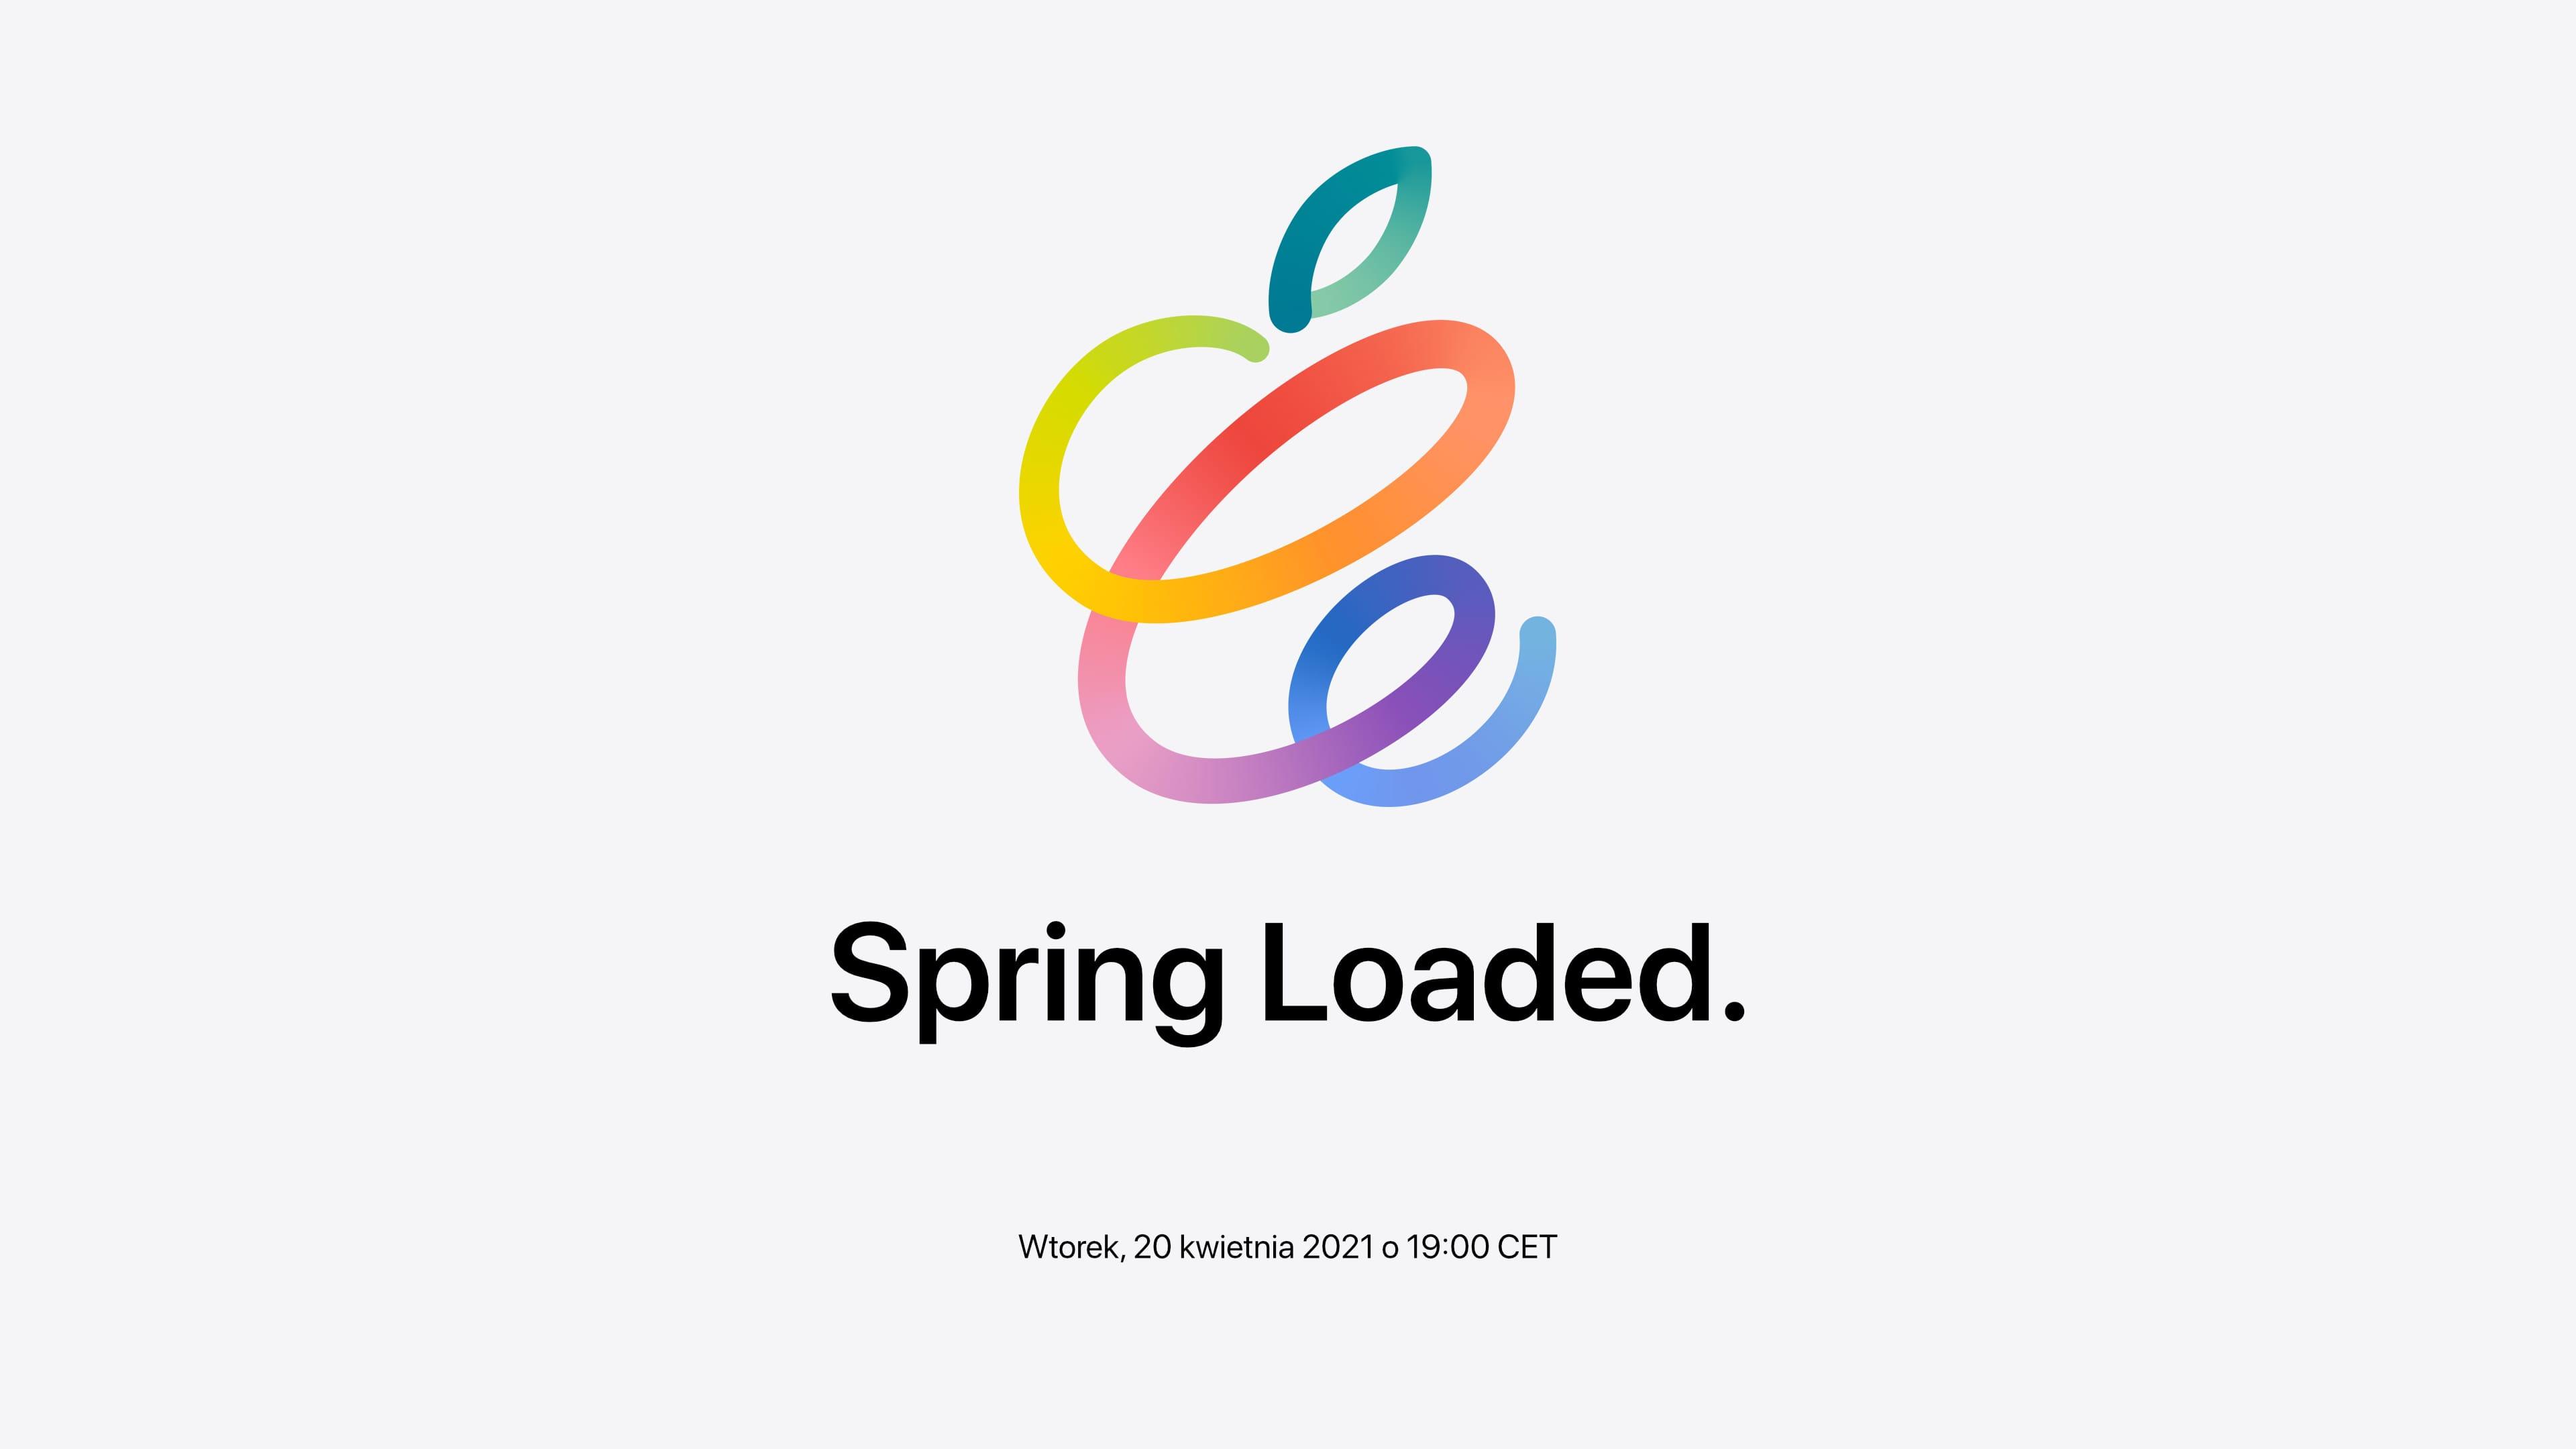 رویداد جدید اپل Spring loaded